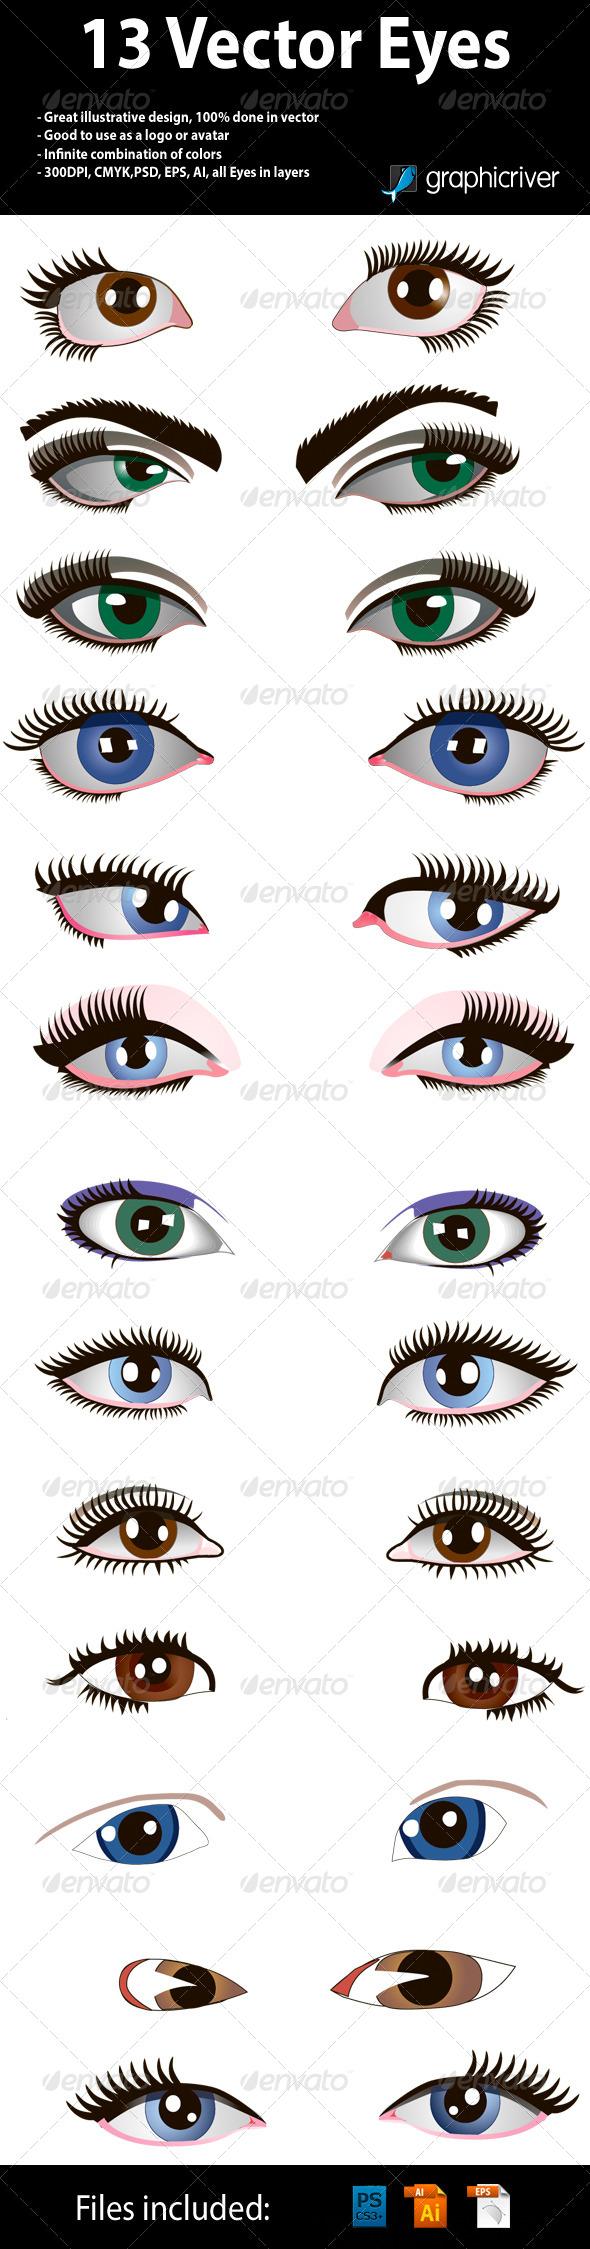 GraphicRiver 13 Vector Eyes 4495887